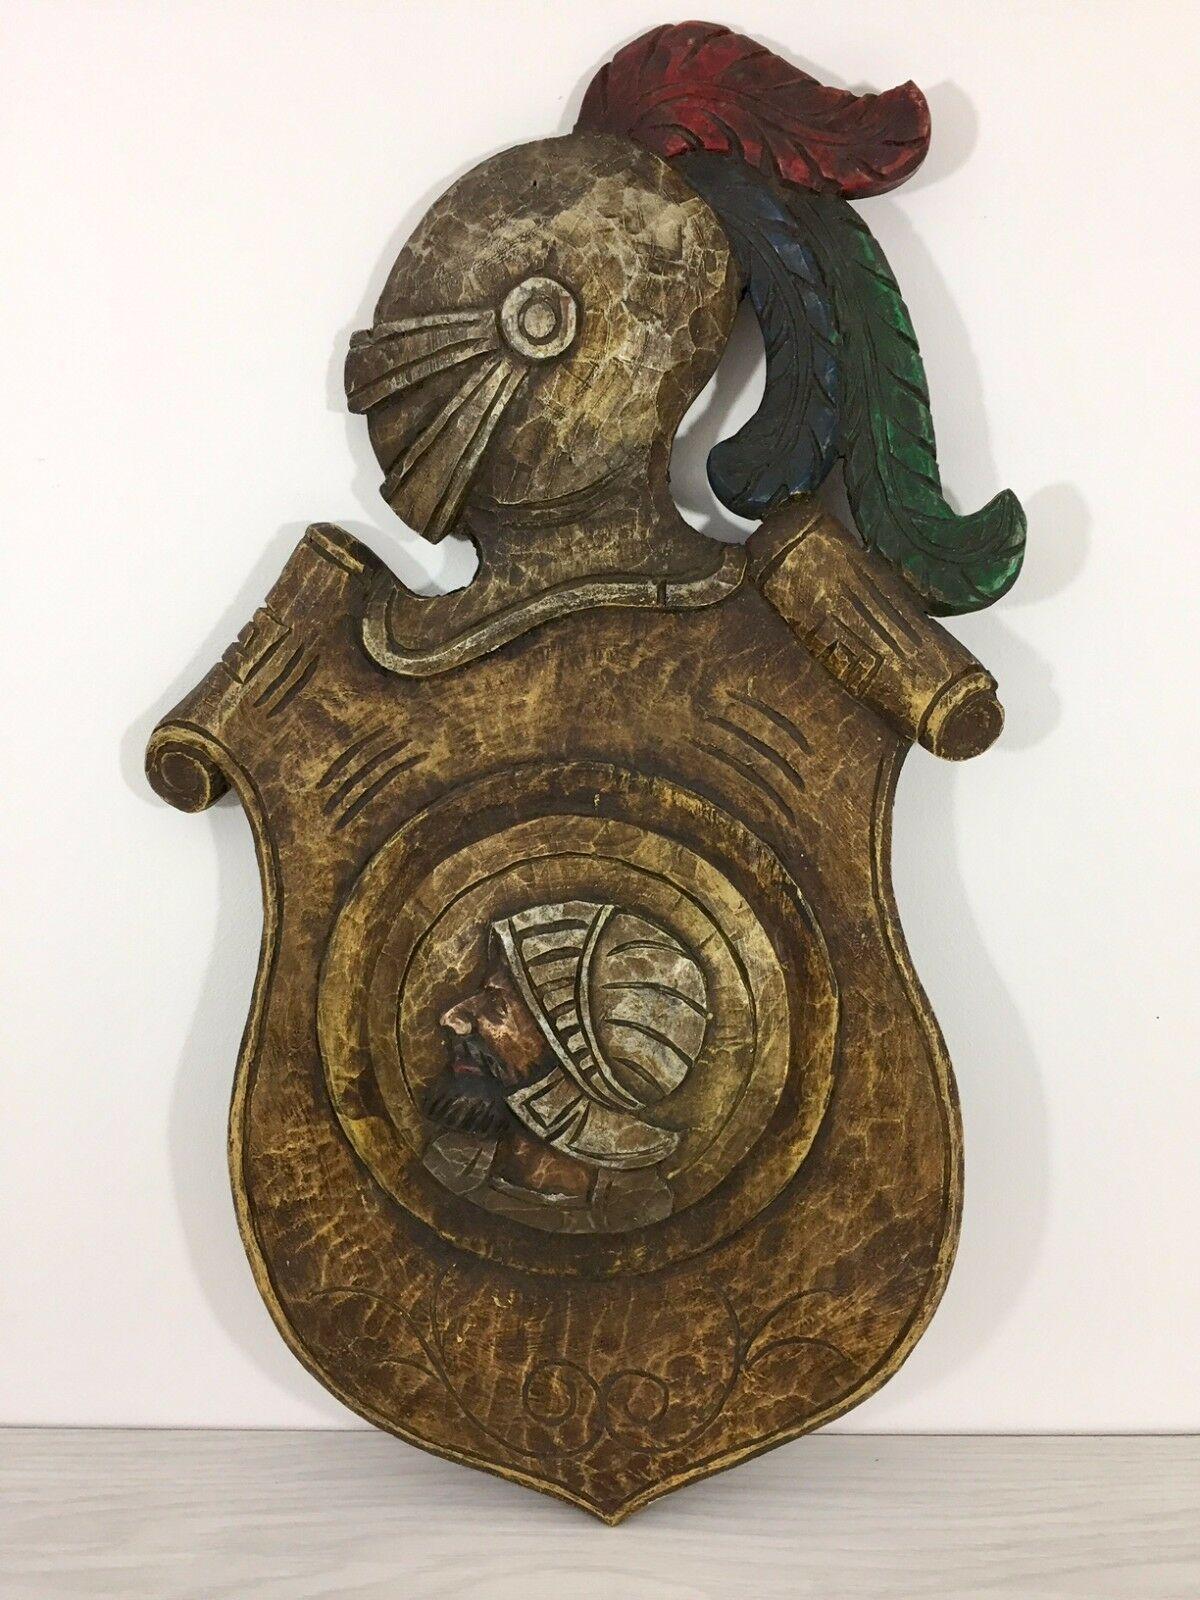 Antique 1900 German black forest carved wood shield medieval knight shop sign image 8